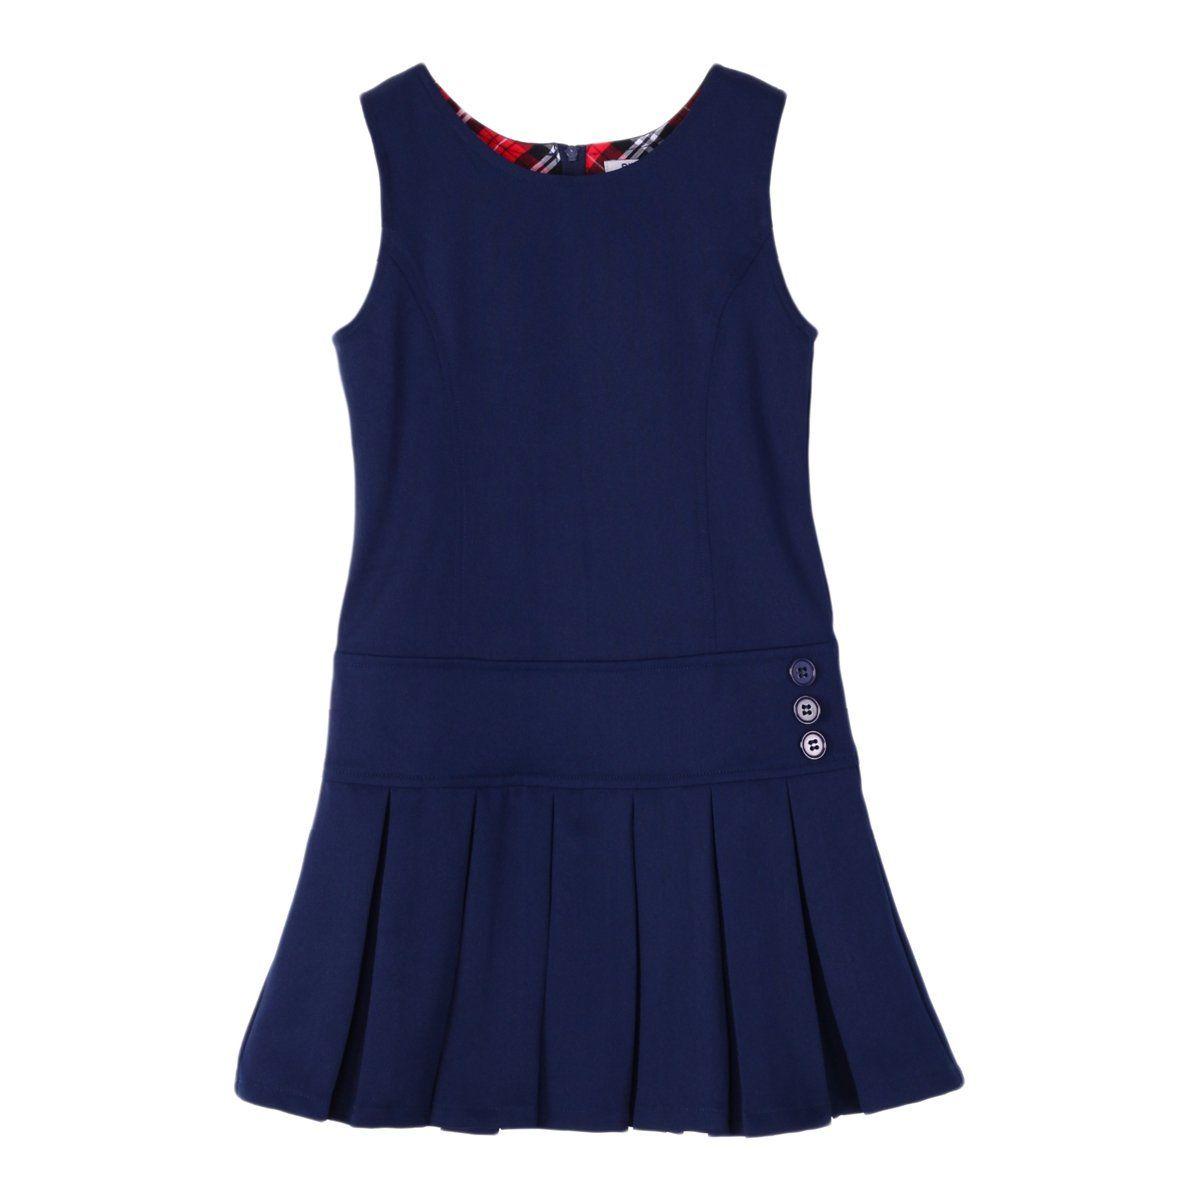 Bienzoe girlus stretchy pleated hem school uniforms jumper navy